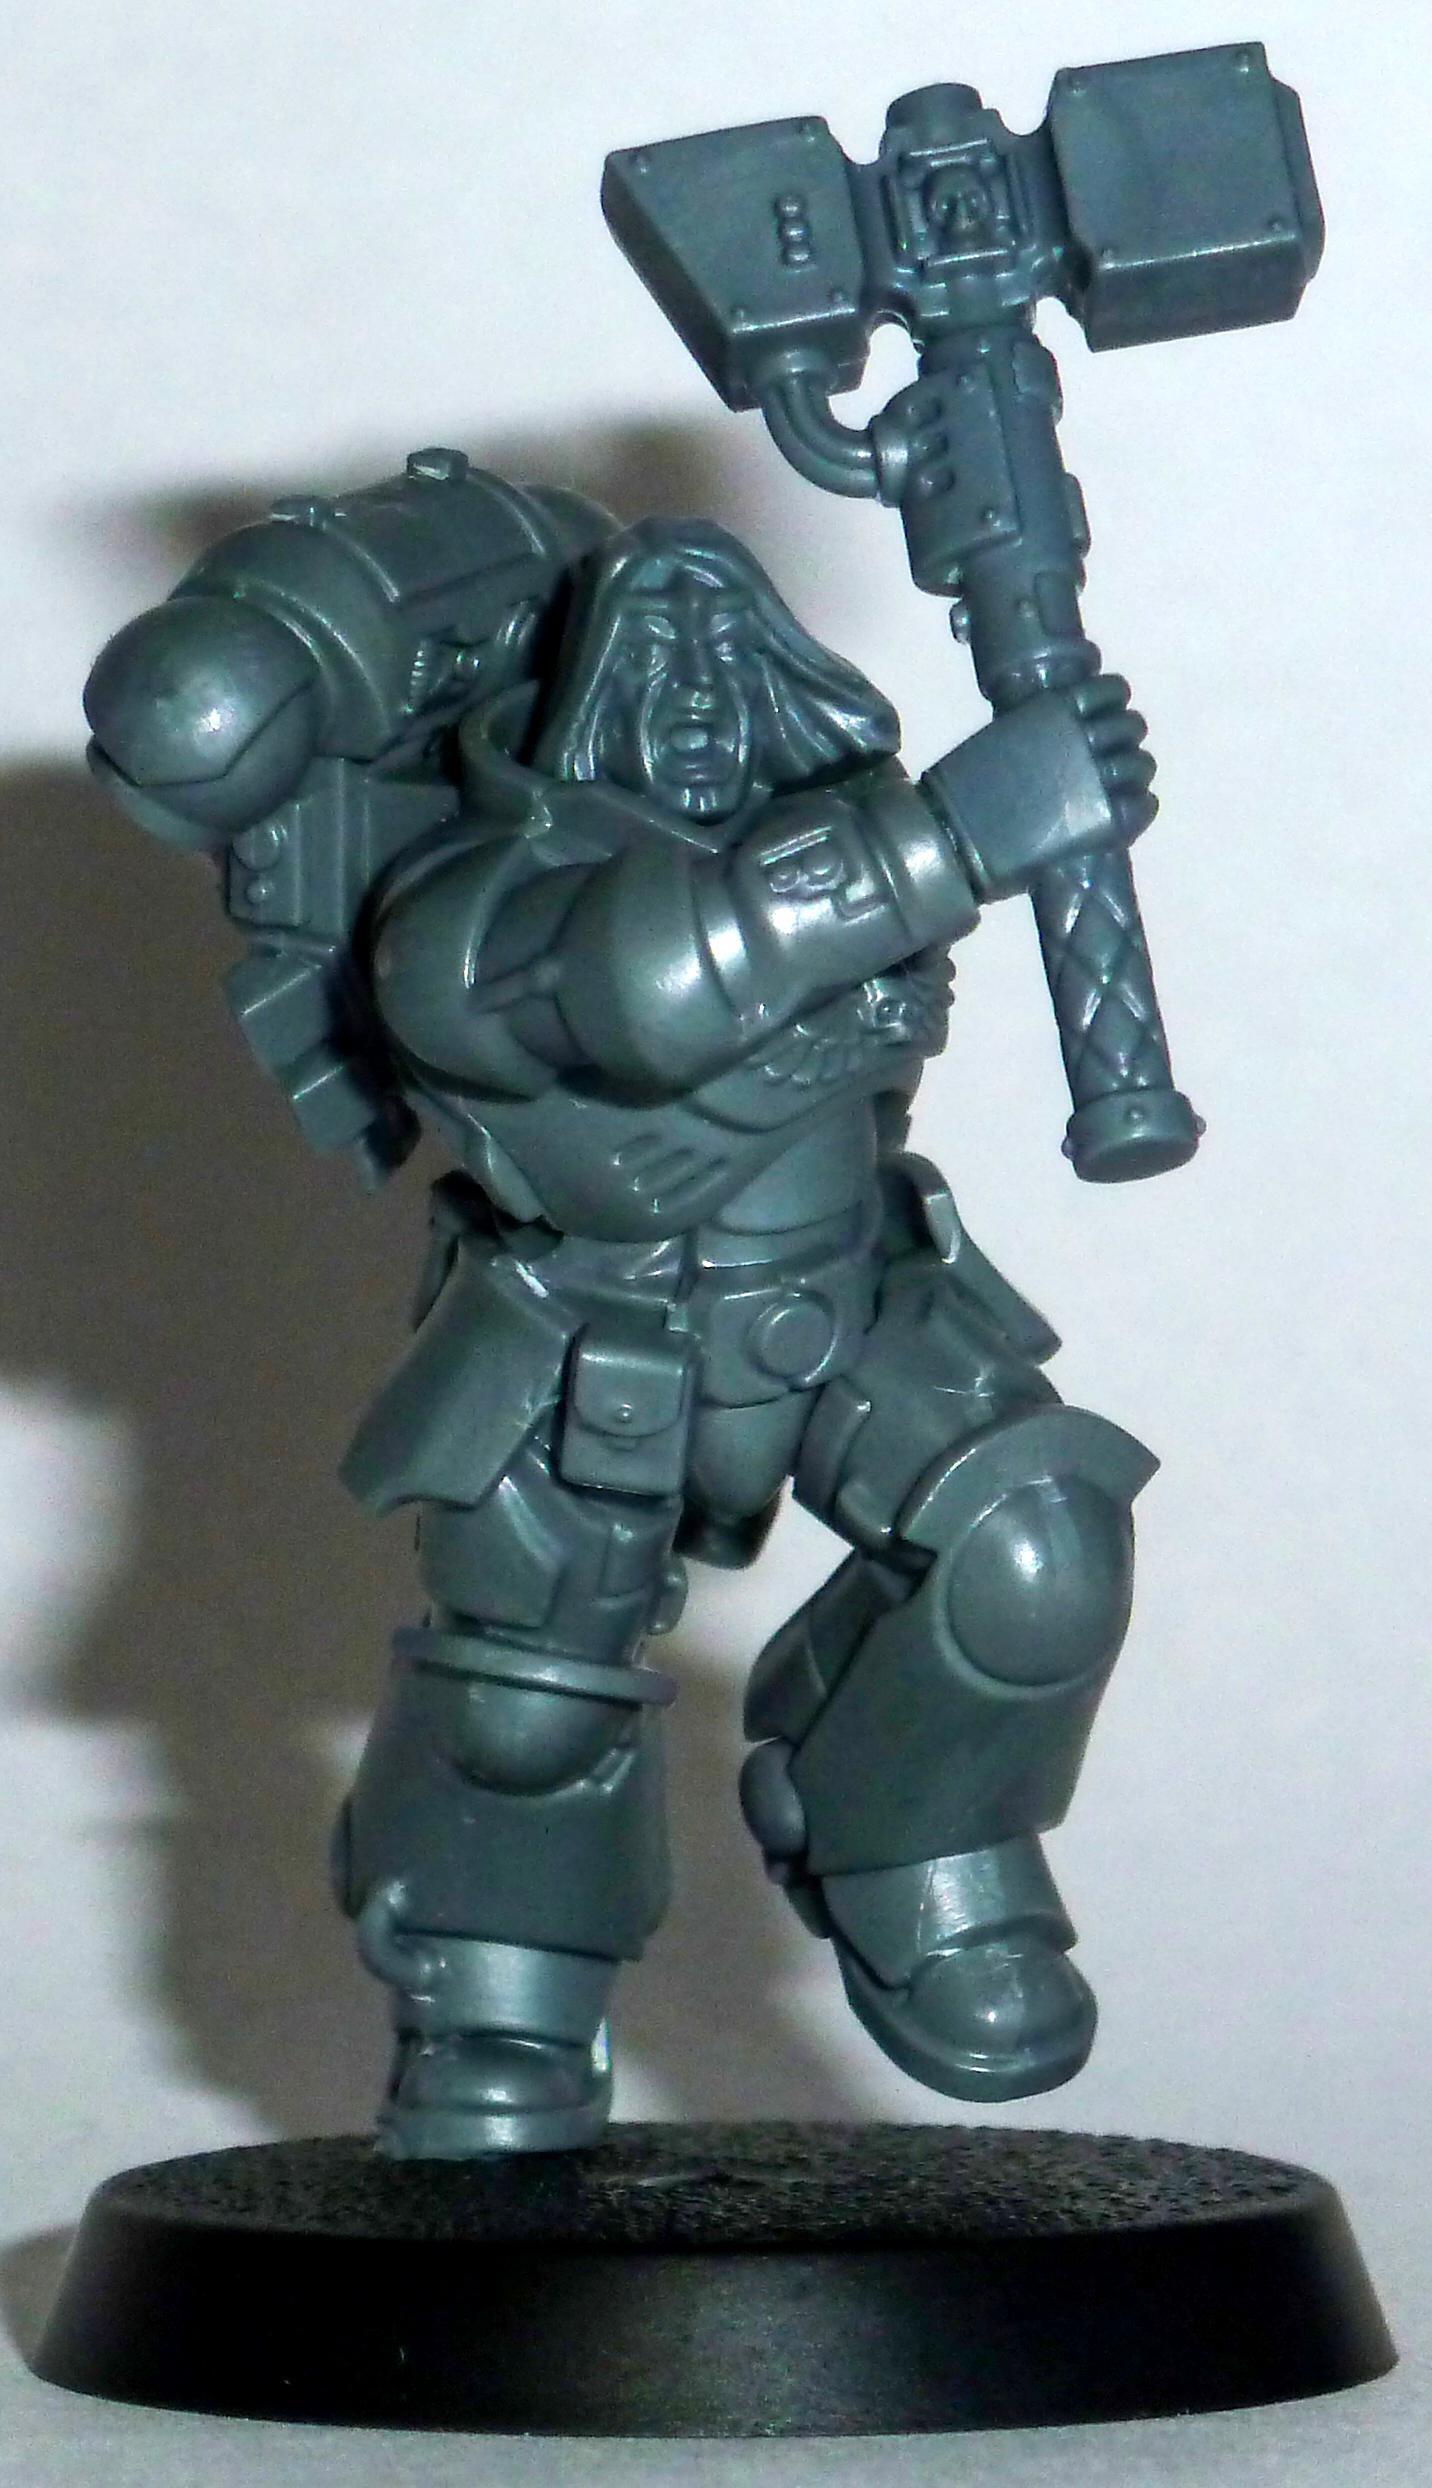 Deathwatch, Dynamic, He-man, Inquisition, Ordo Xenos, Primaris, Space Marines